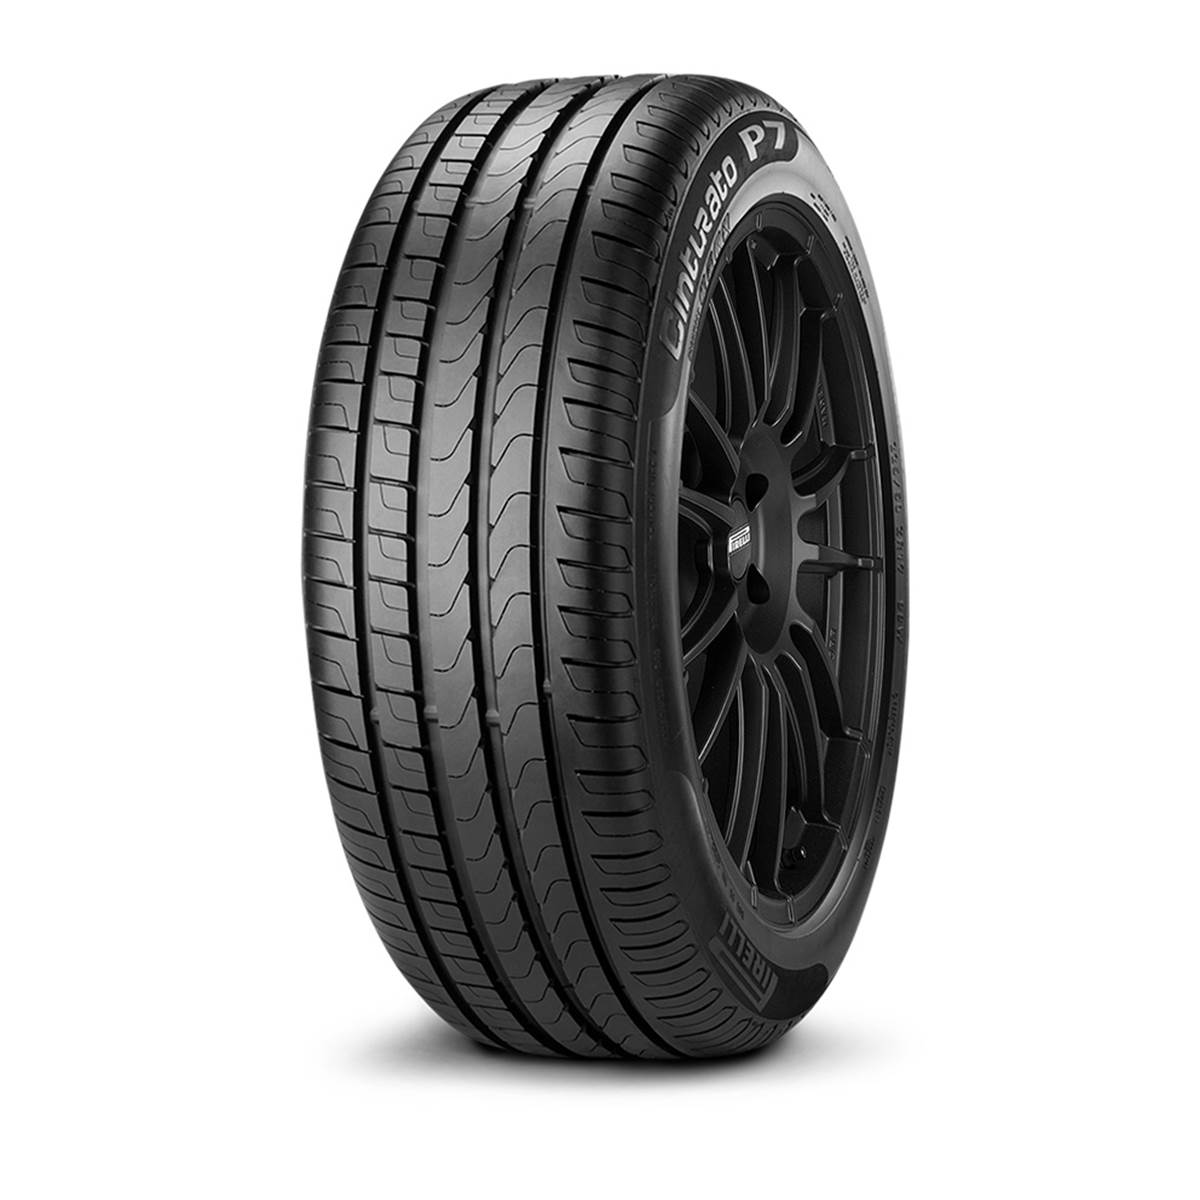 Pneu Pirelli 225/60R17 99V Cinturato P7